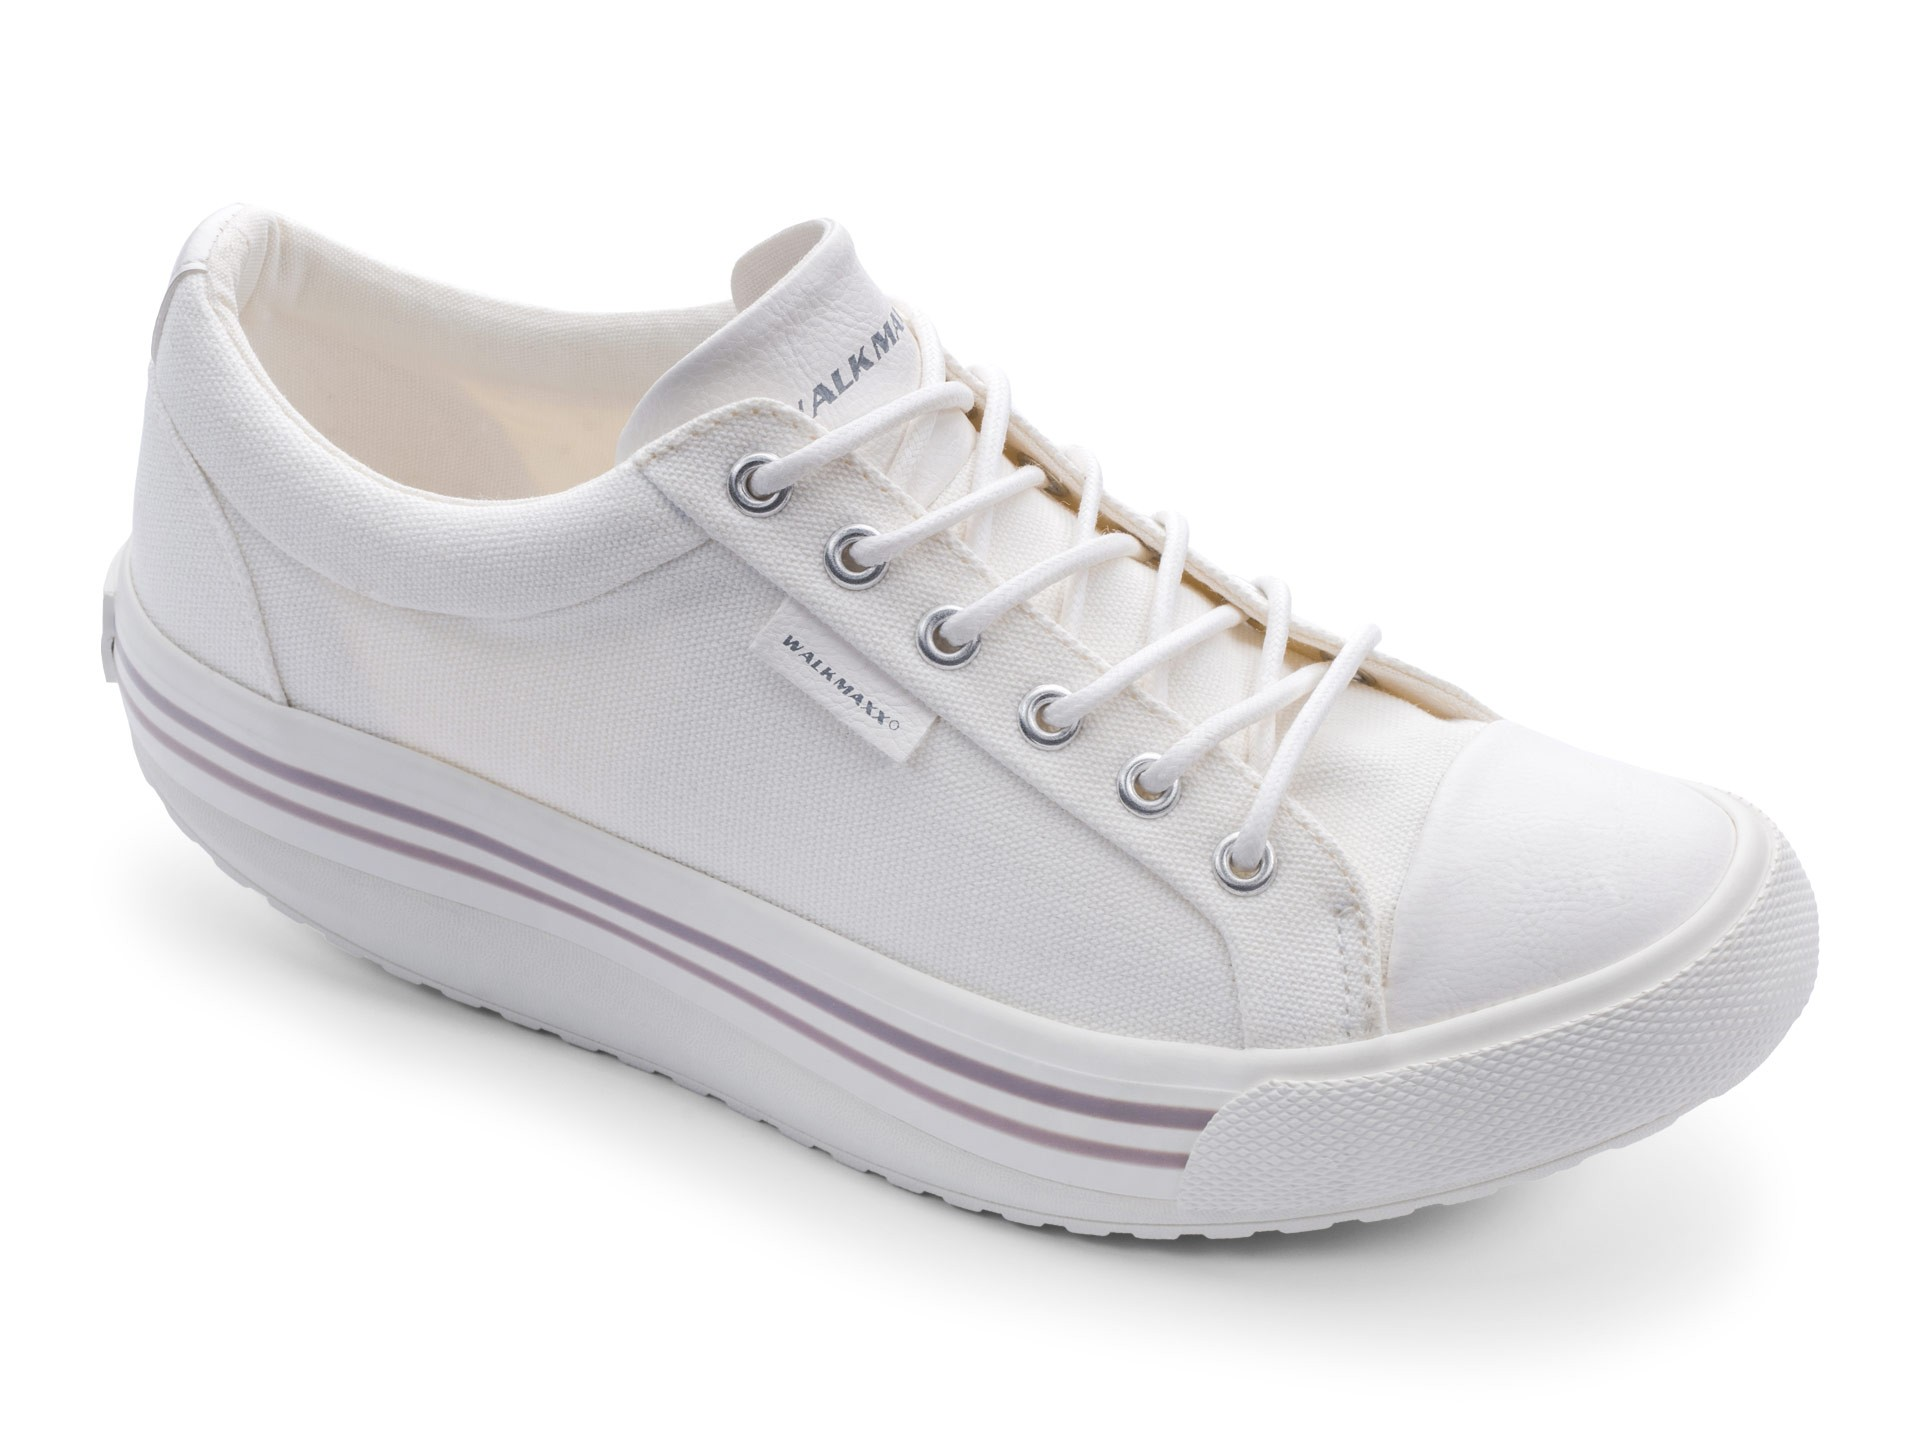 Szabadidőcipő 3.0, Comfort Walkmaxx